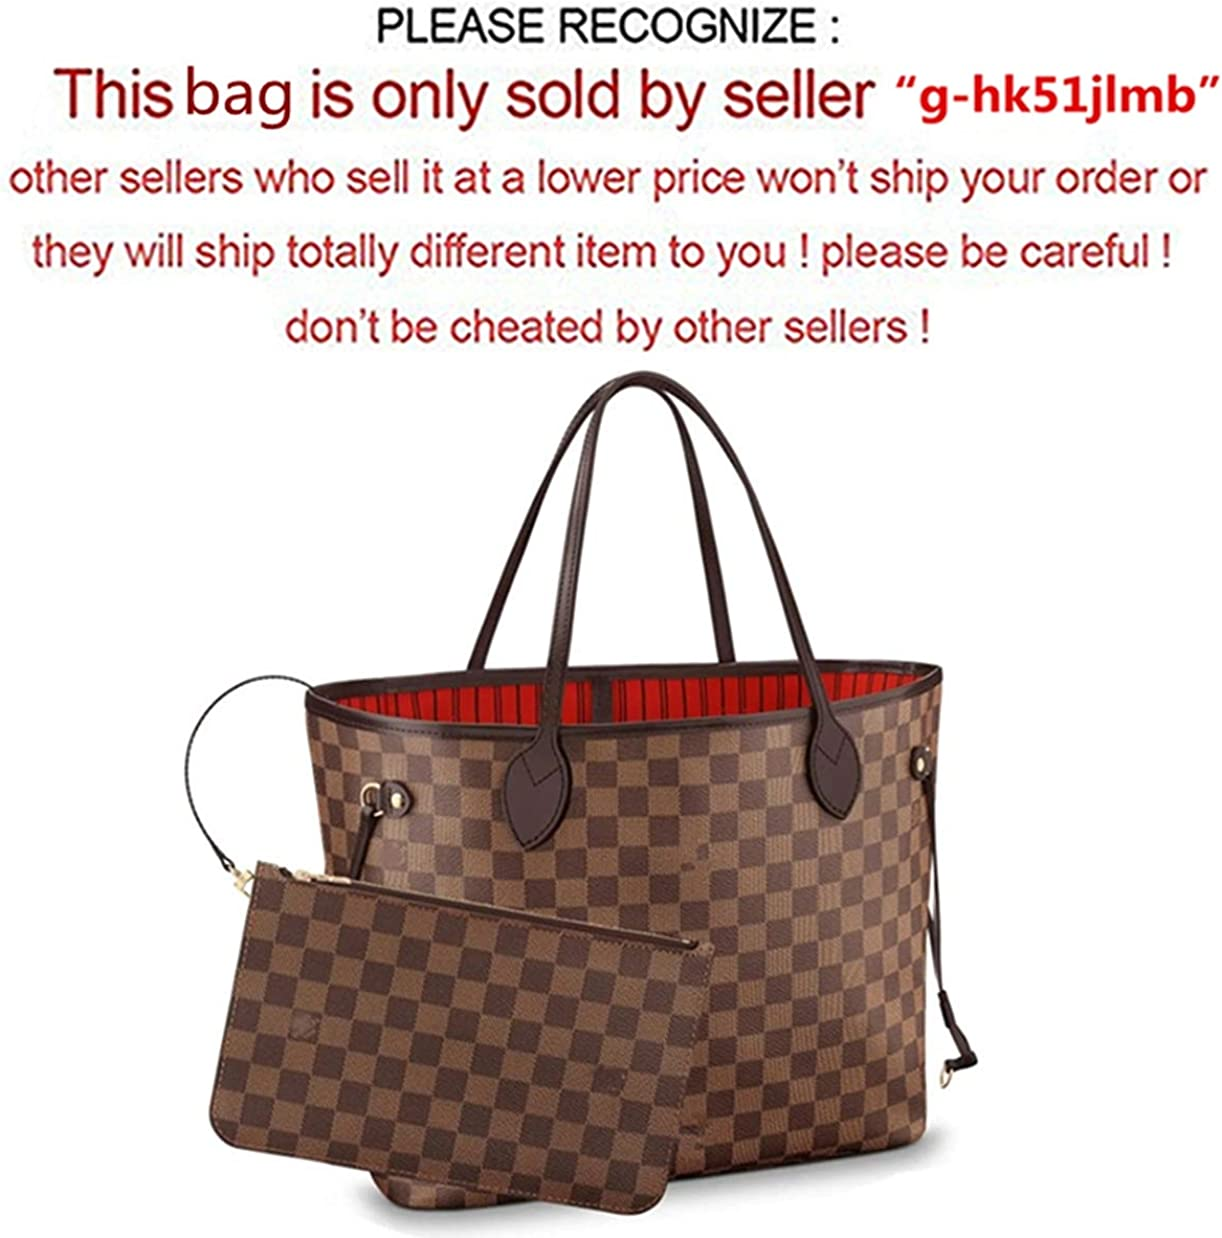 Red Leather House Woman Organizer Handbag Damier Tote Shoulder Fashion Bag Brown 40x32x20cm